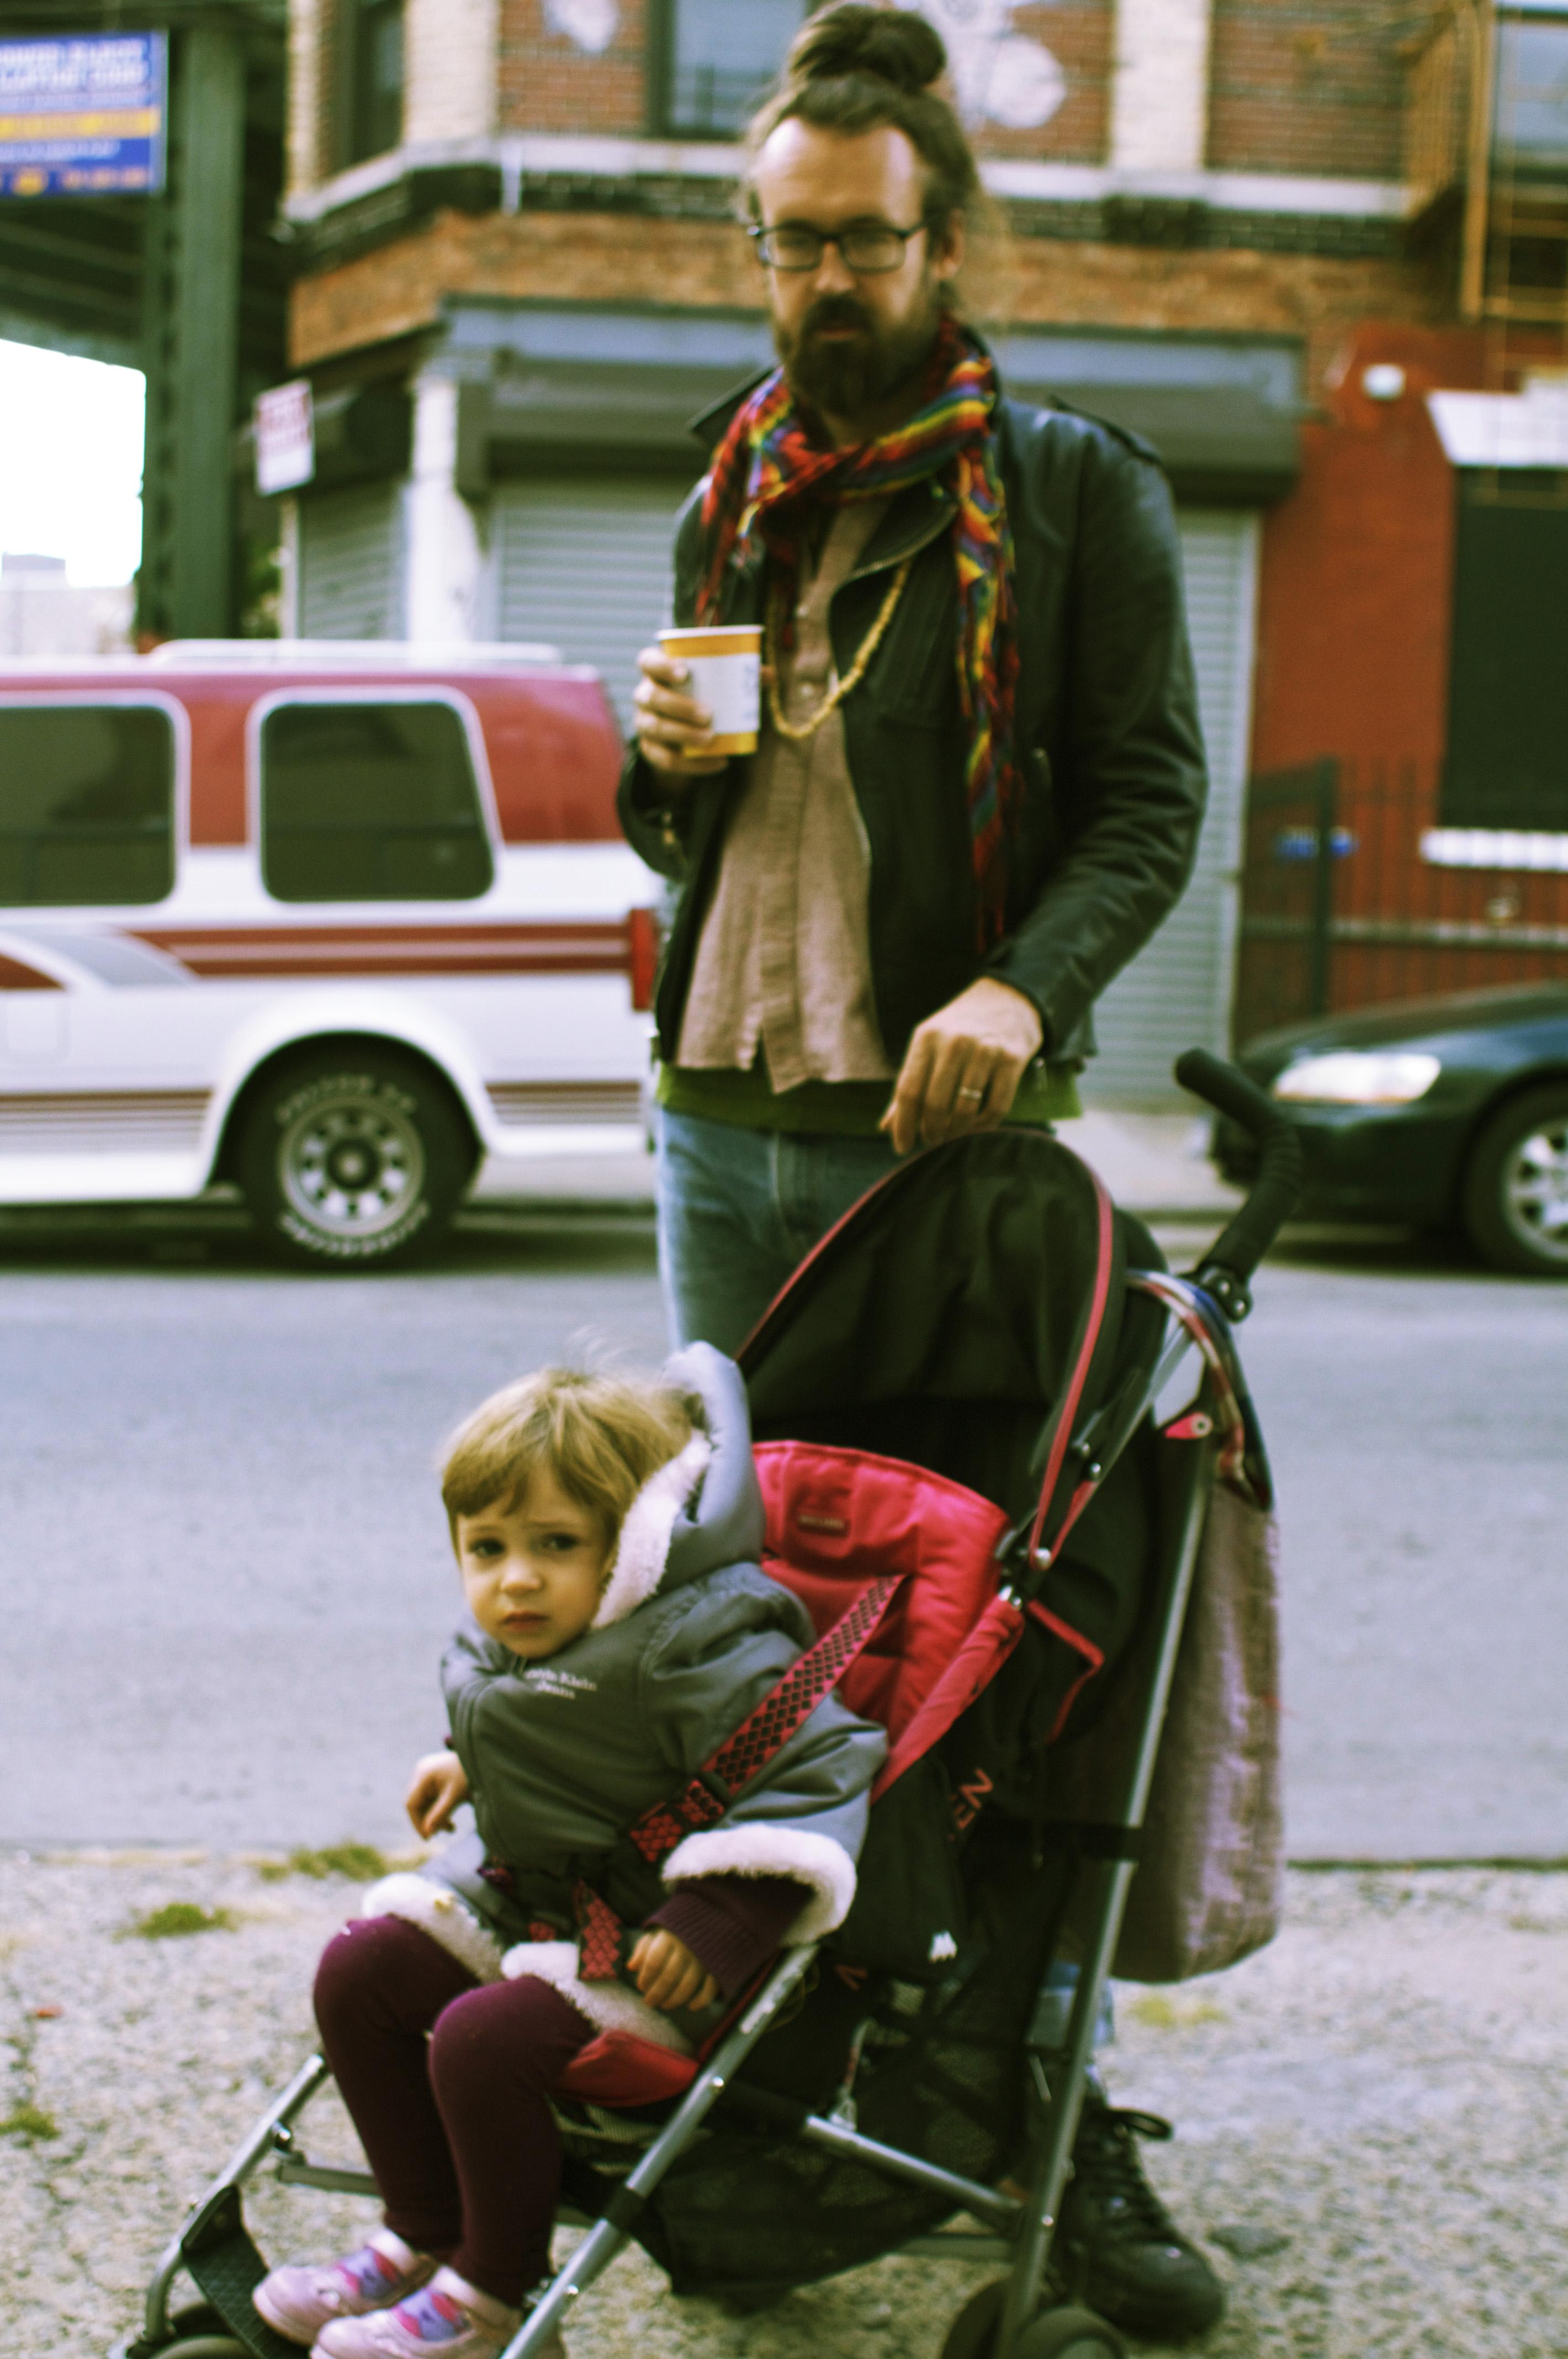 hipster kid   Bushwick Daily